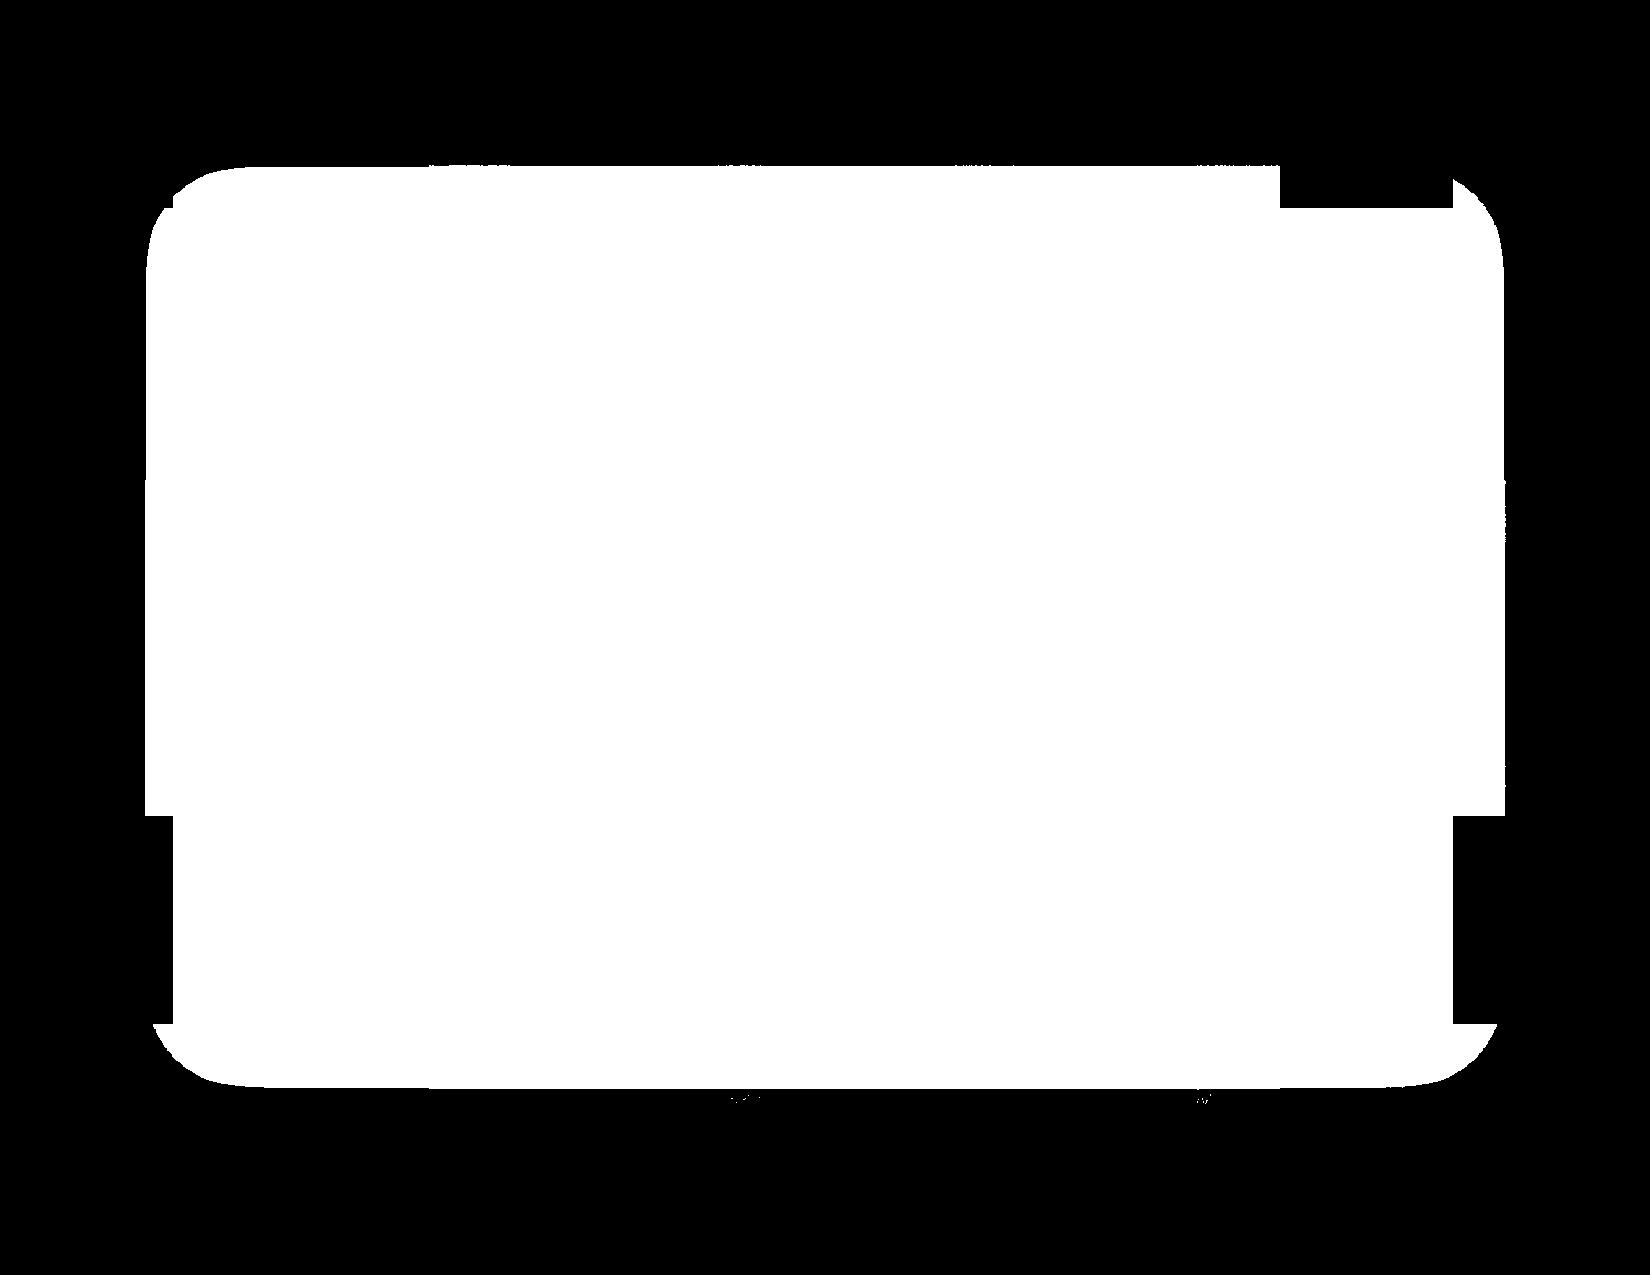 transparent black border - HD1650×1275